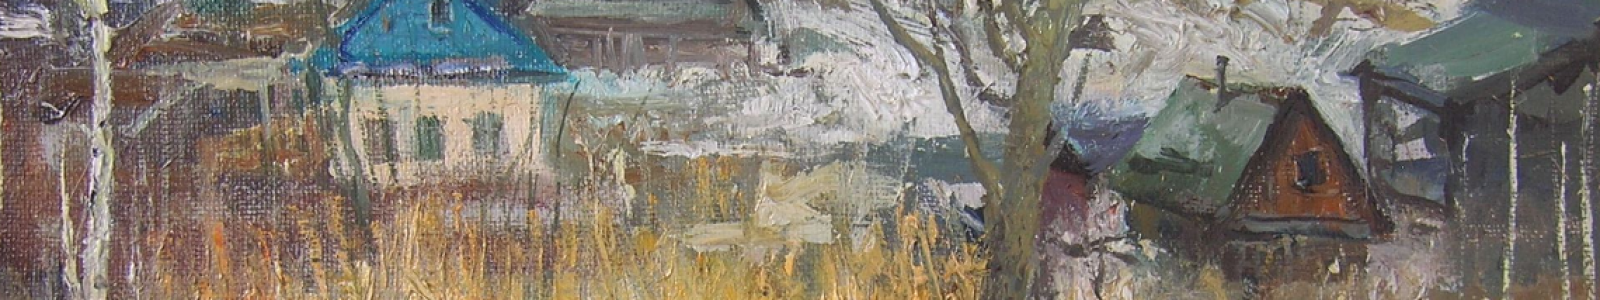 Gallery Painter Gennadyi Sharoikin